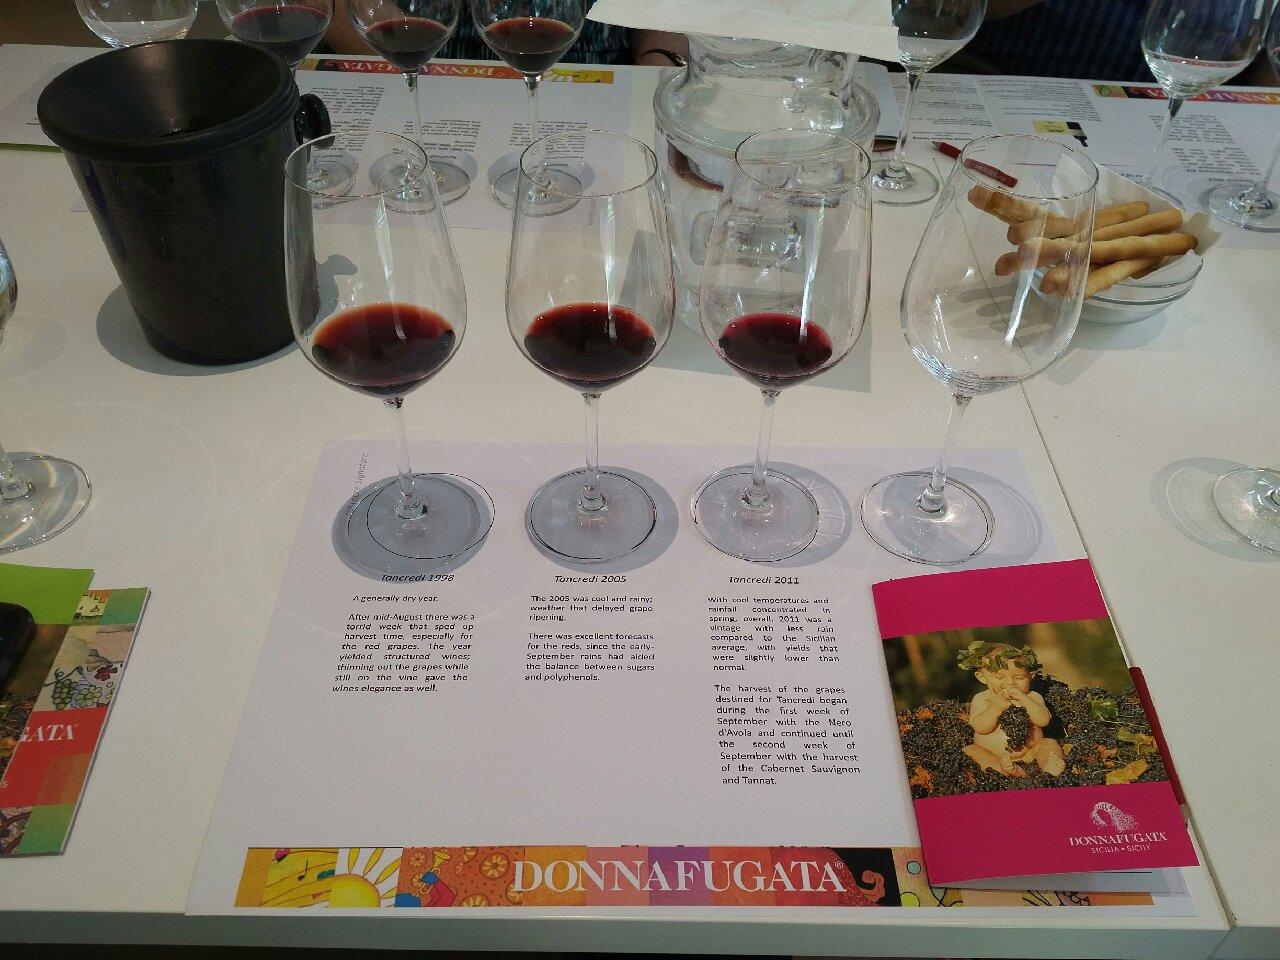 The wine Tancredi, Donnafugata, Marsala, Sicily